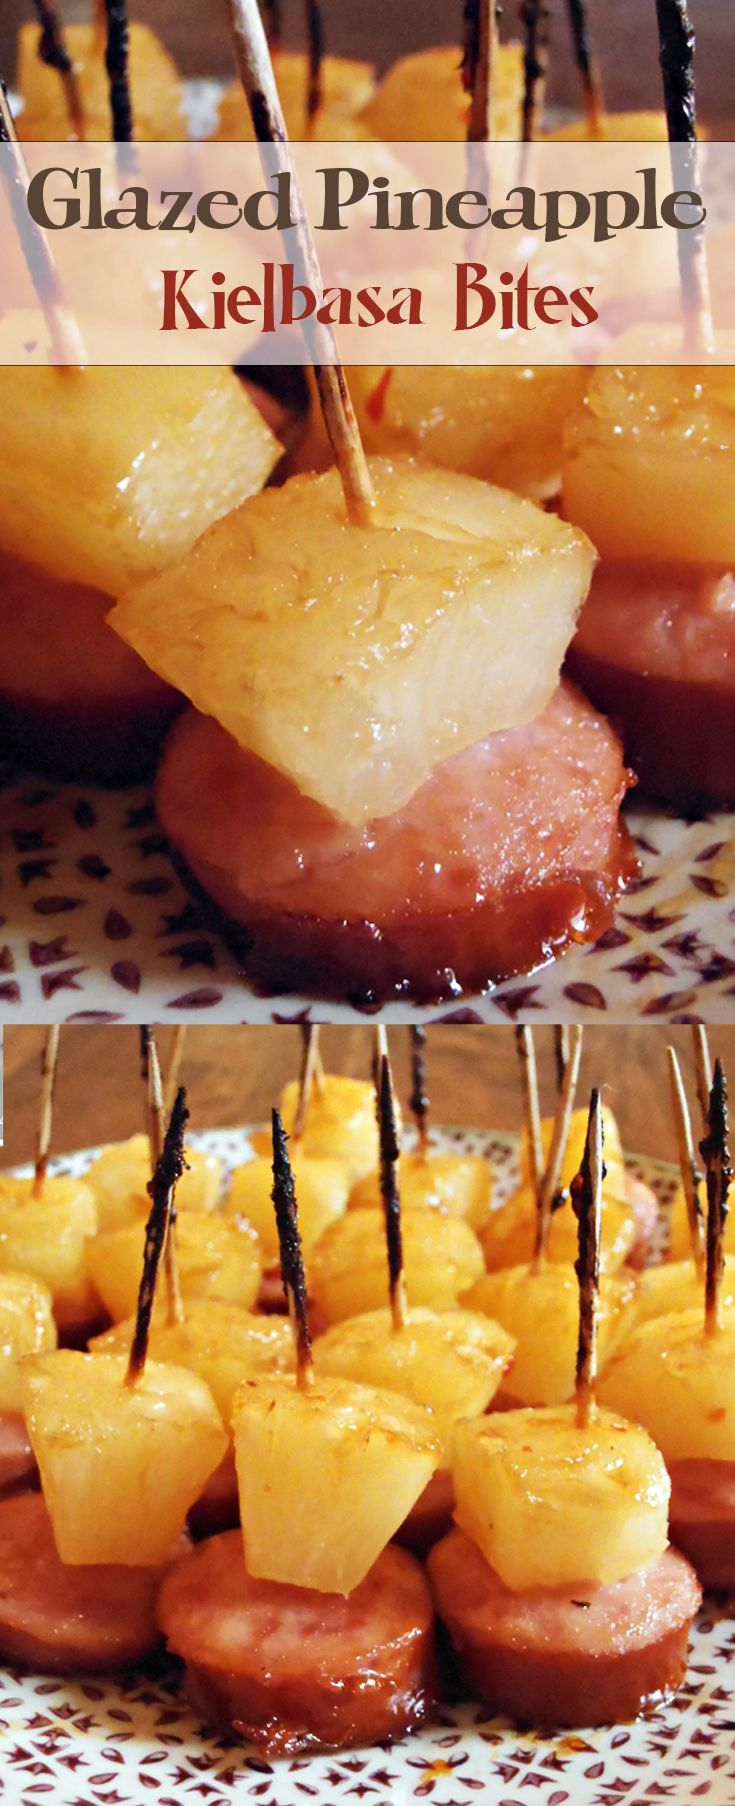 Glazed Pineapple Kielbasa Bites r1